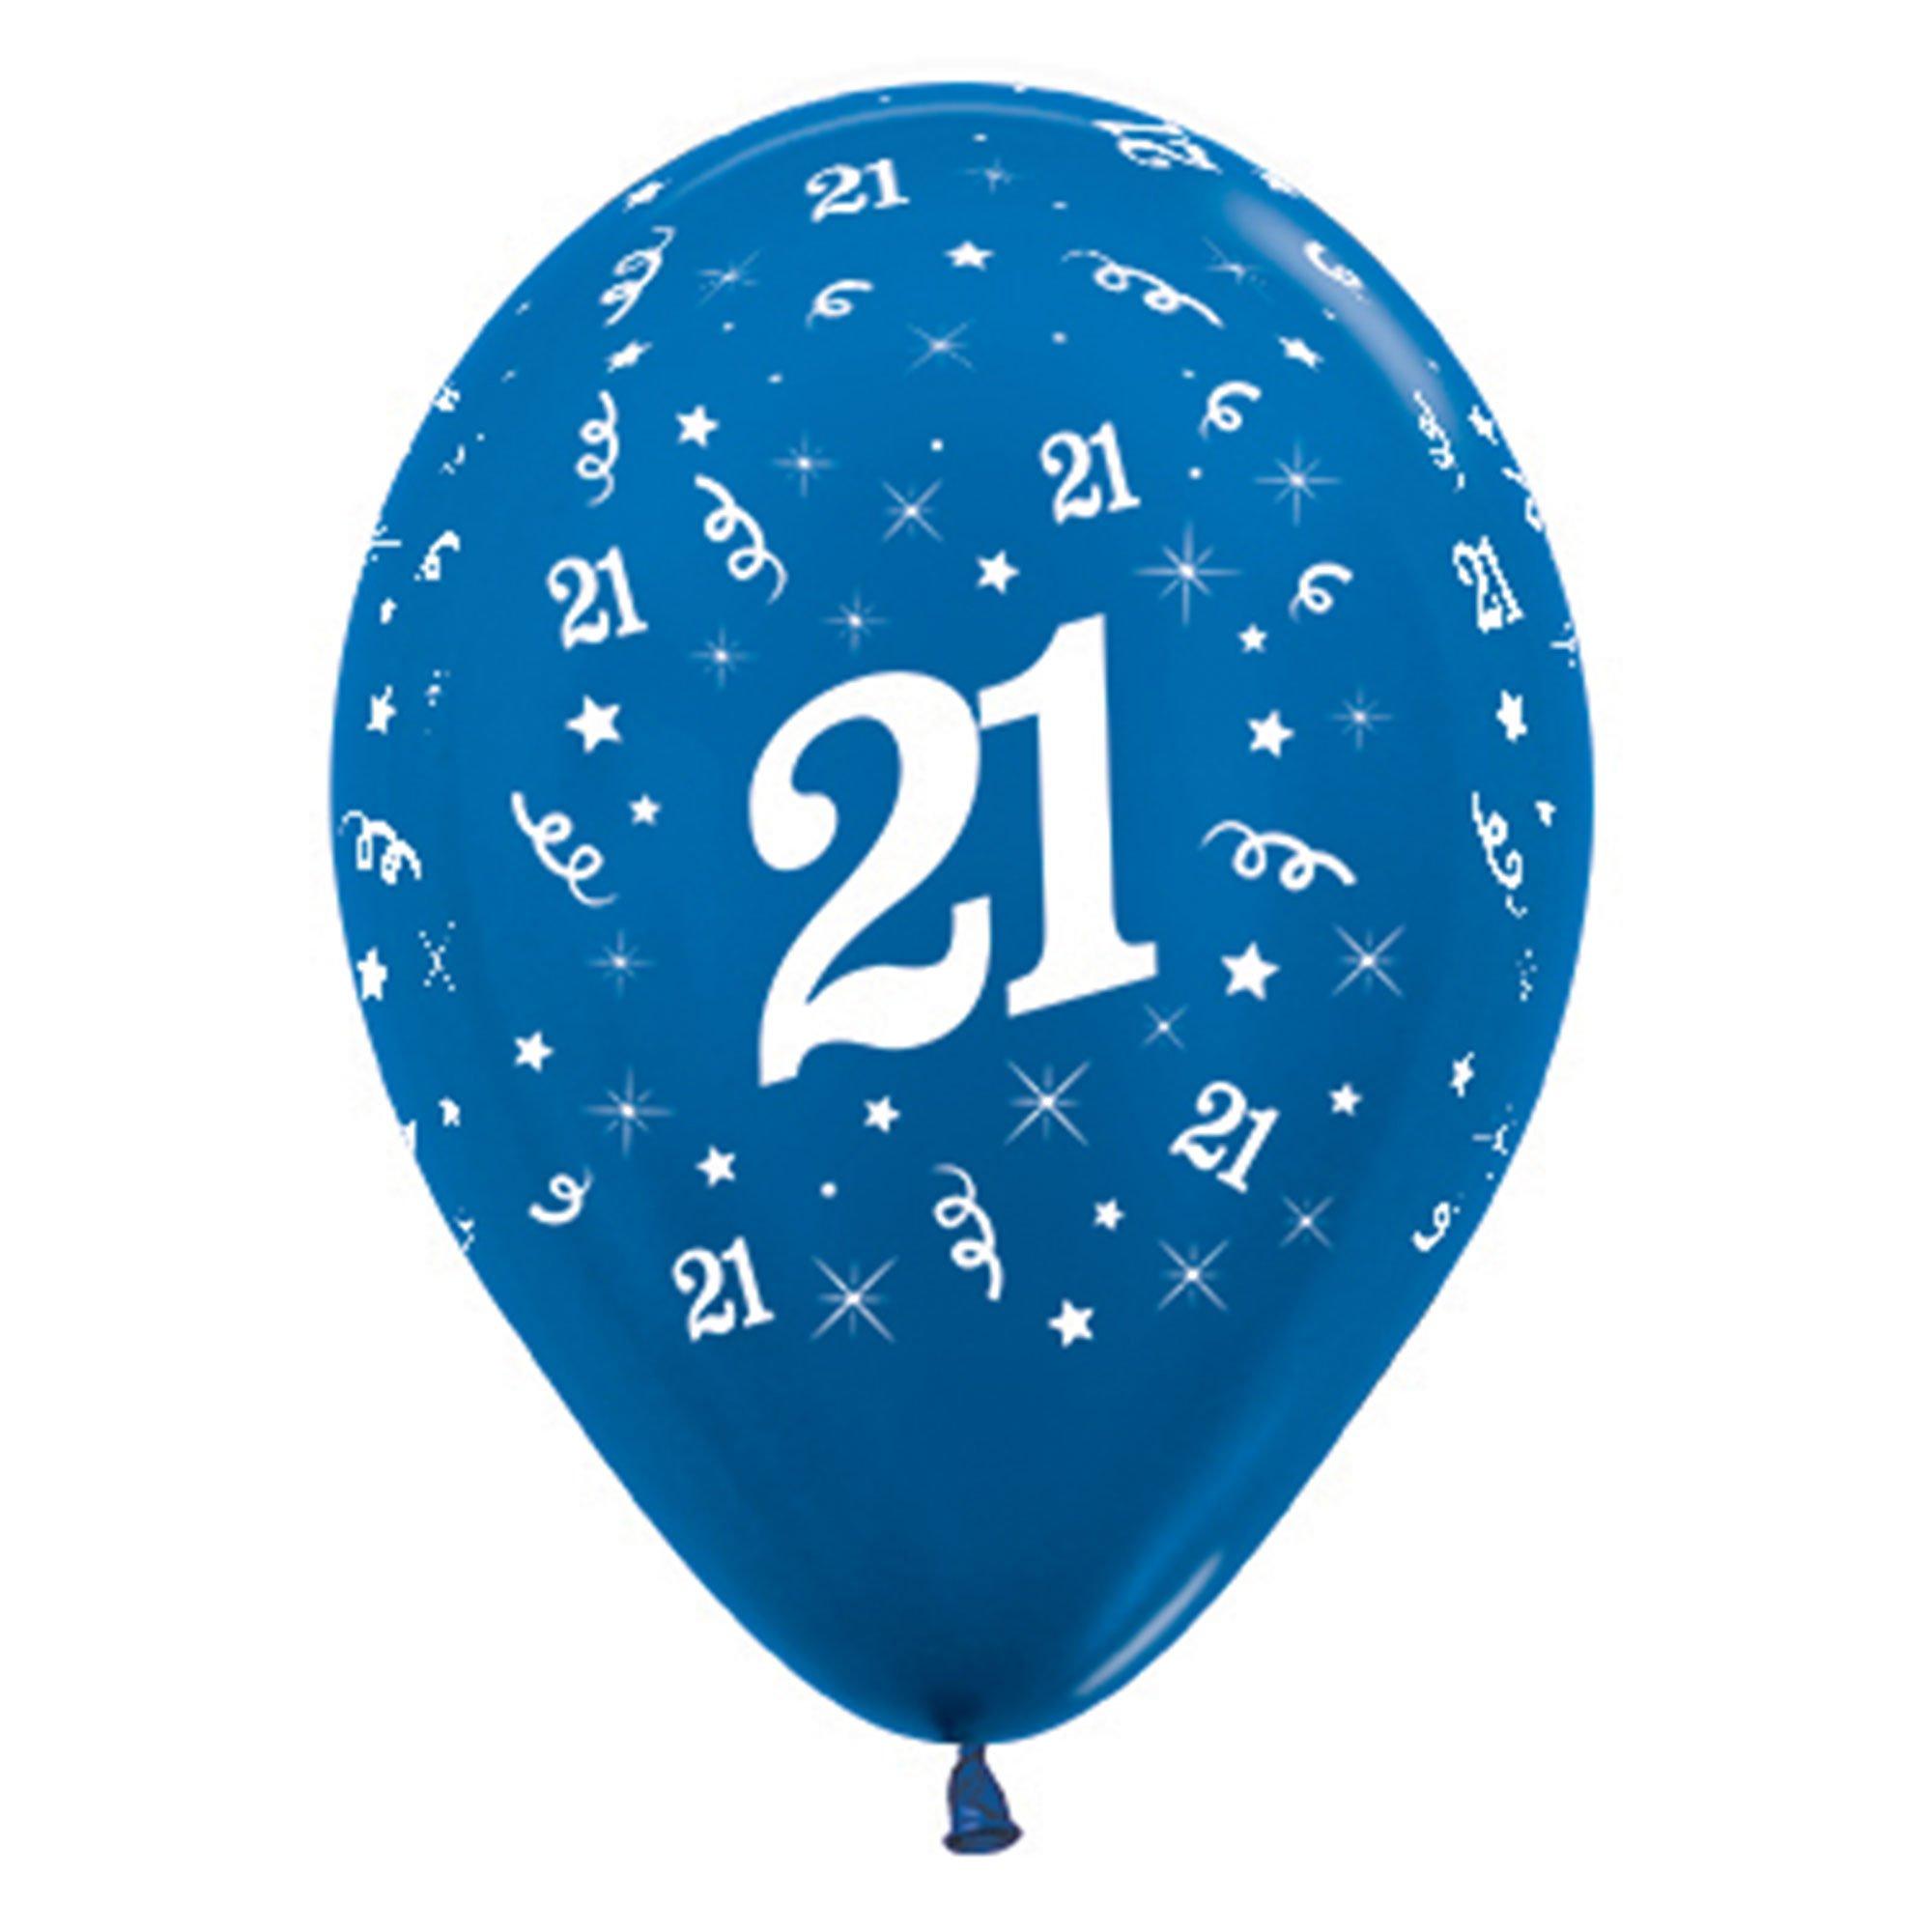 Sempertex 30cm Age 21 Metallic Blue Latex Balloons, 6PK